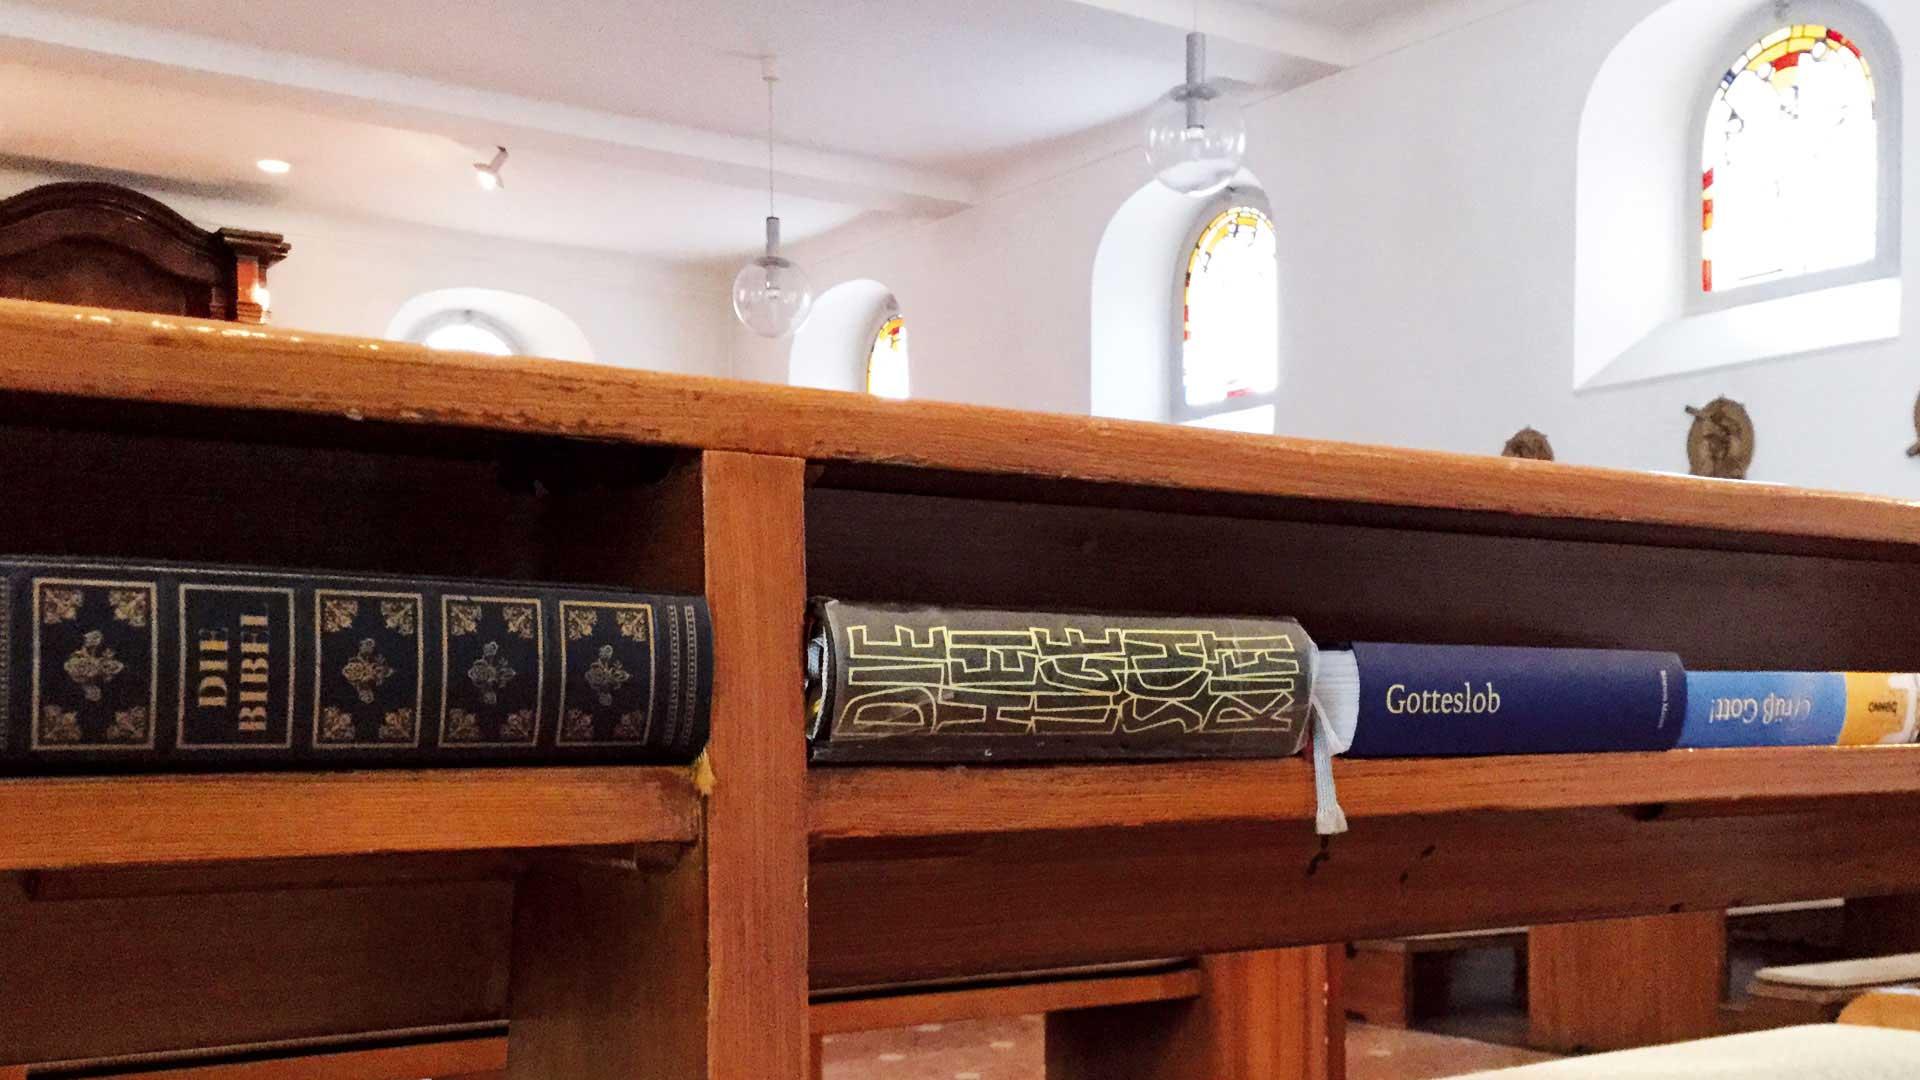 Seniorenzentrum-Bruder-Konrad-Stift-Hauskapelle-St-Anselmus-Bibel-Gotteslob